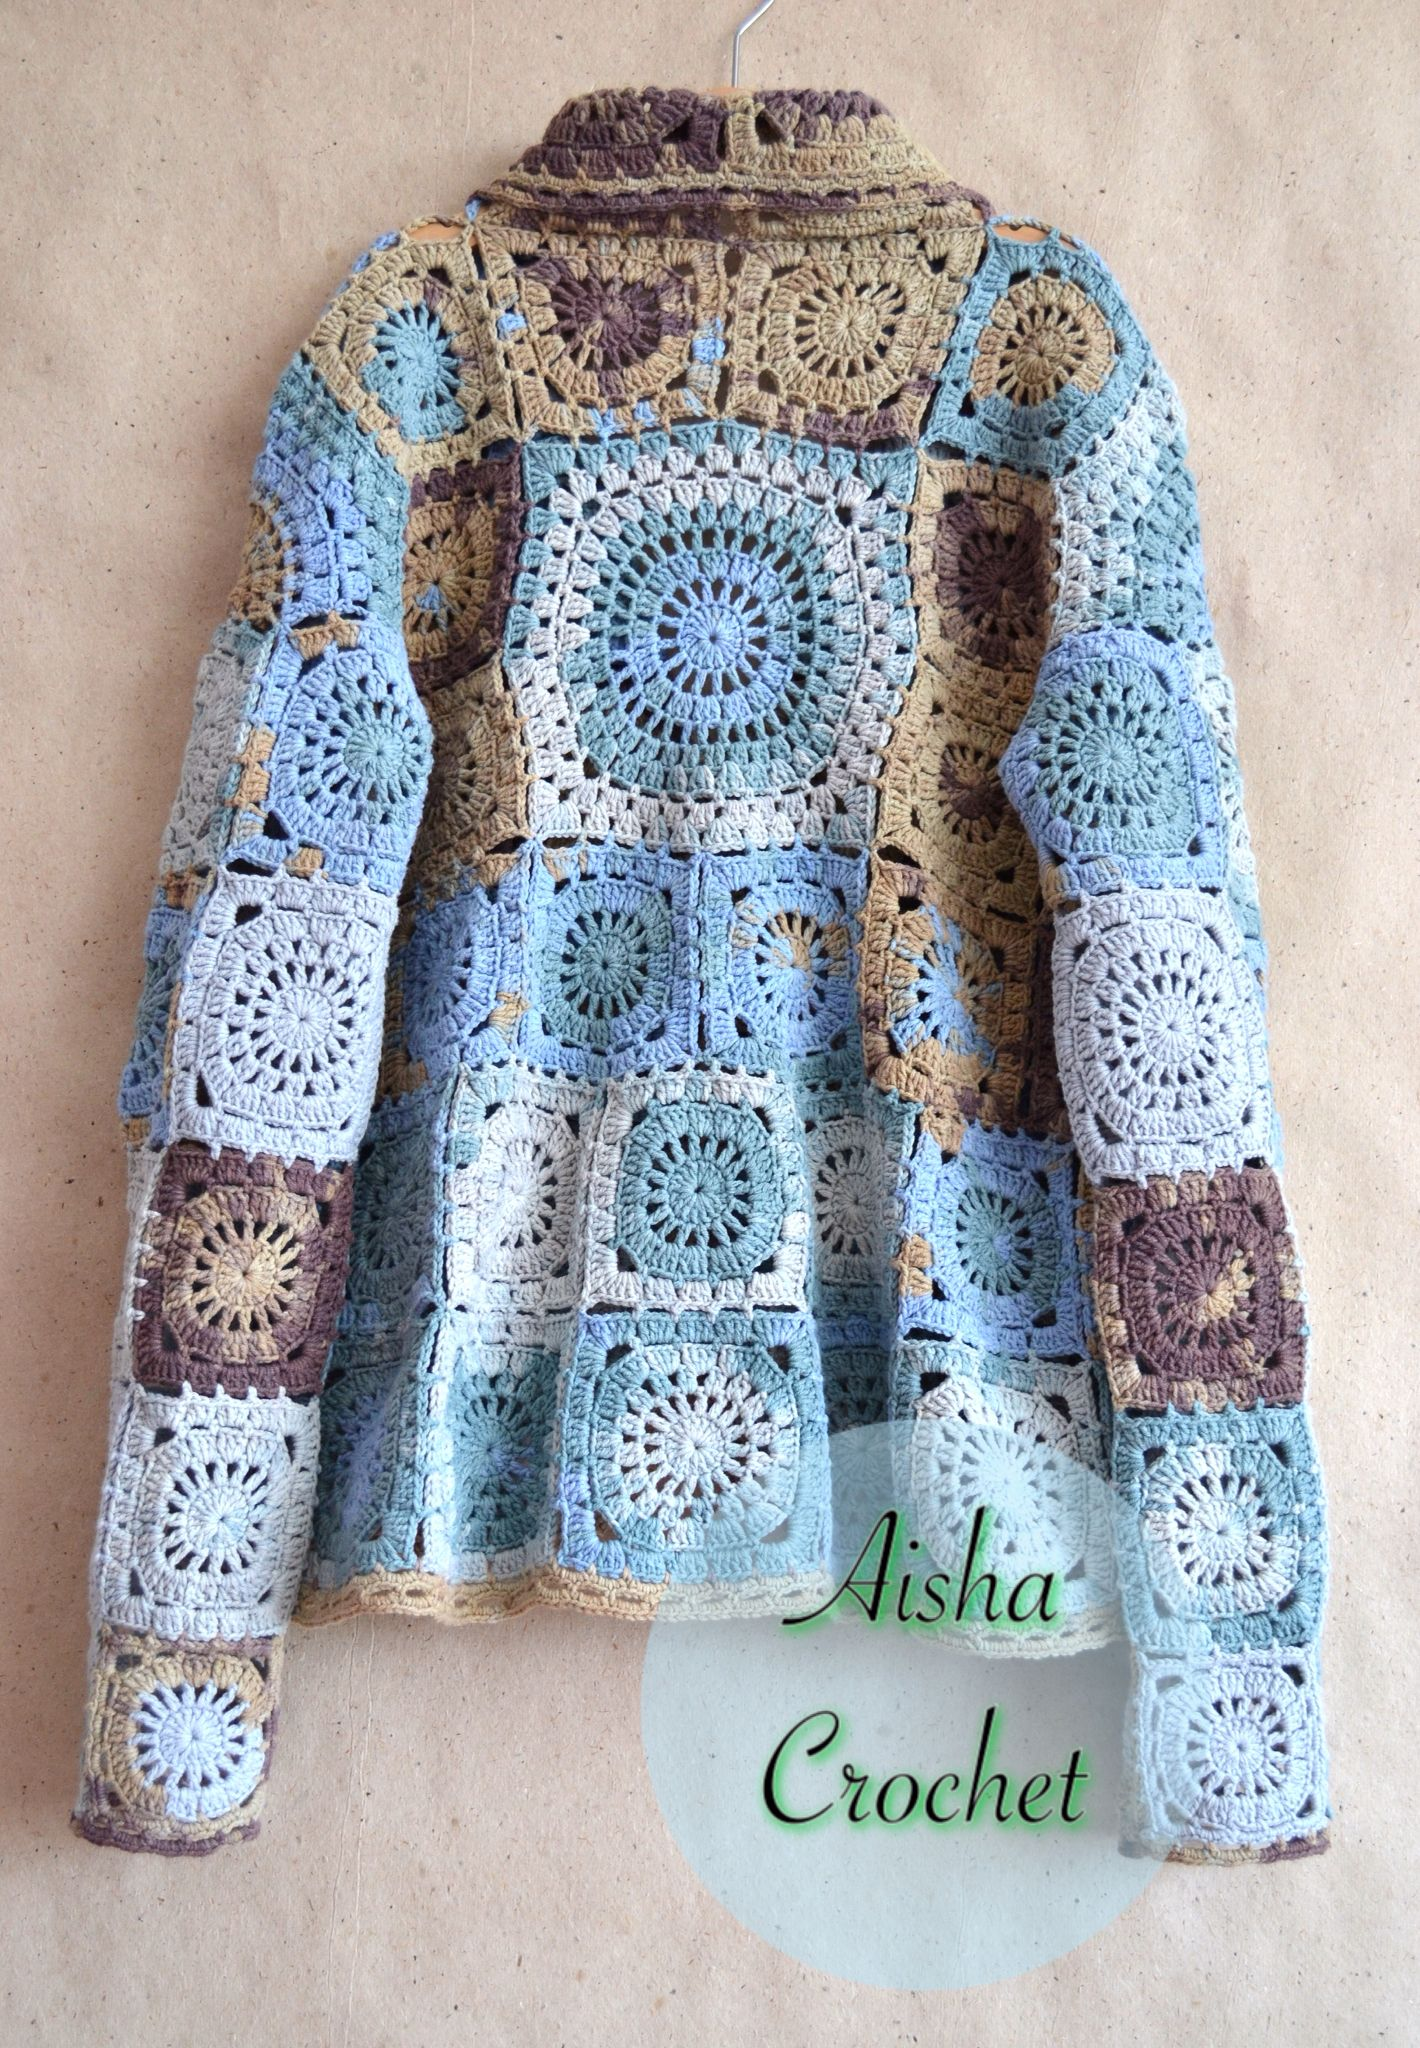 boho jacket sicilia by aisha crochet aisha crochet pinterest boho crochet and granny squares. Black Bedroom Furniture Sets. Home Design Ideas